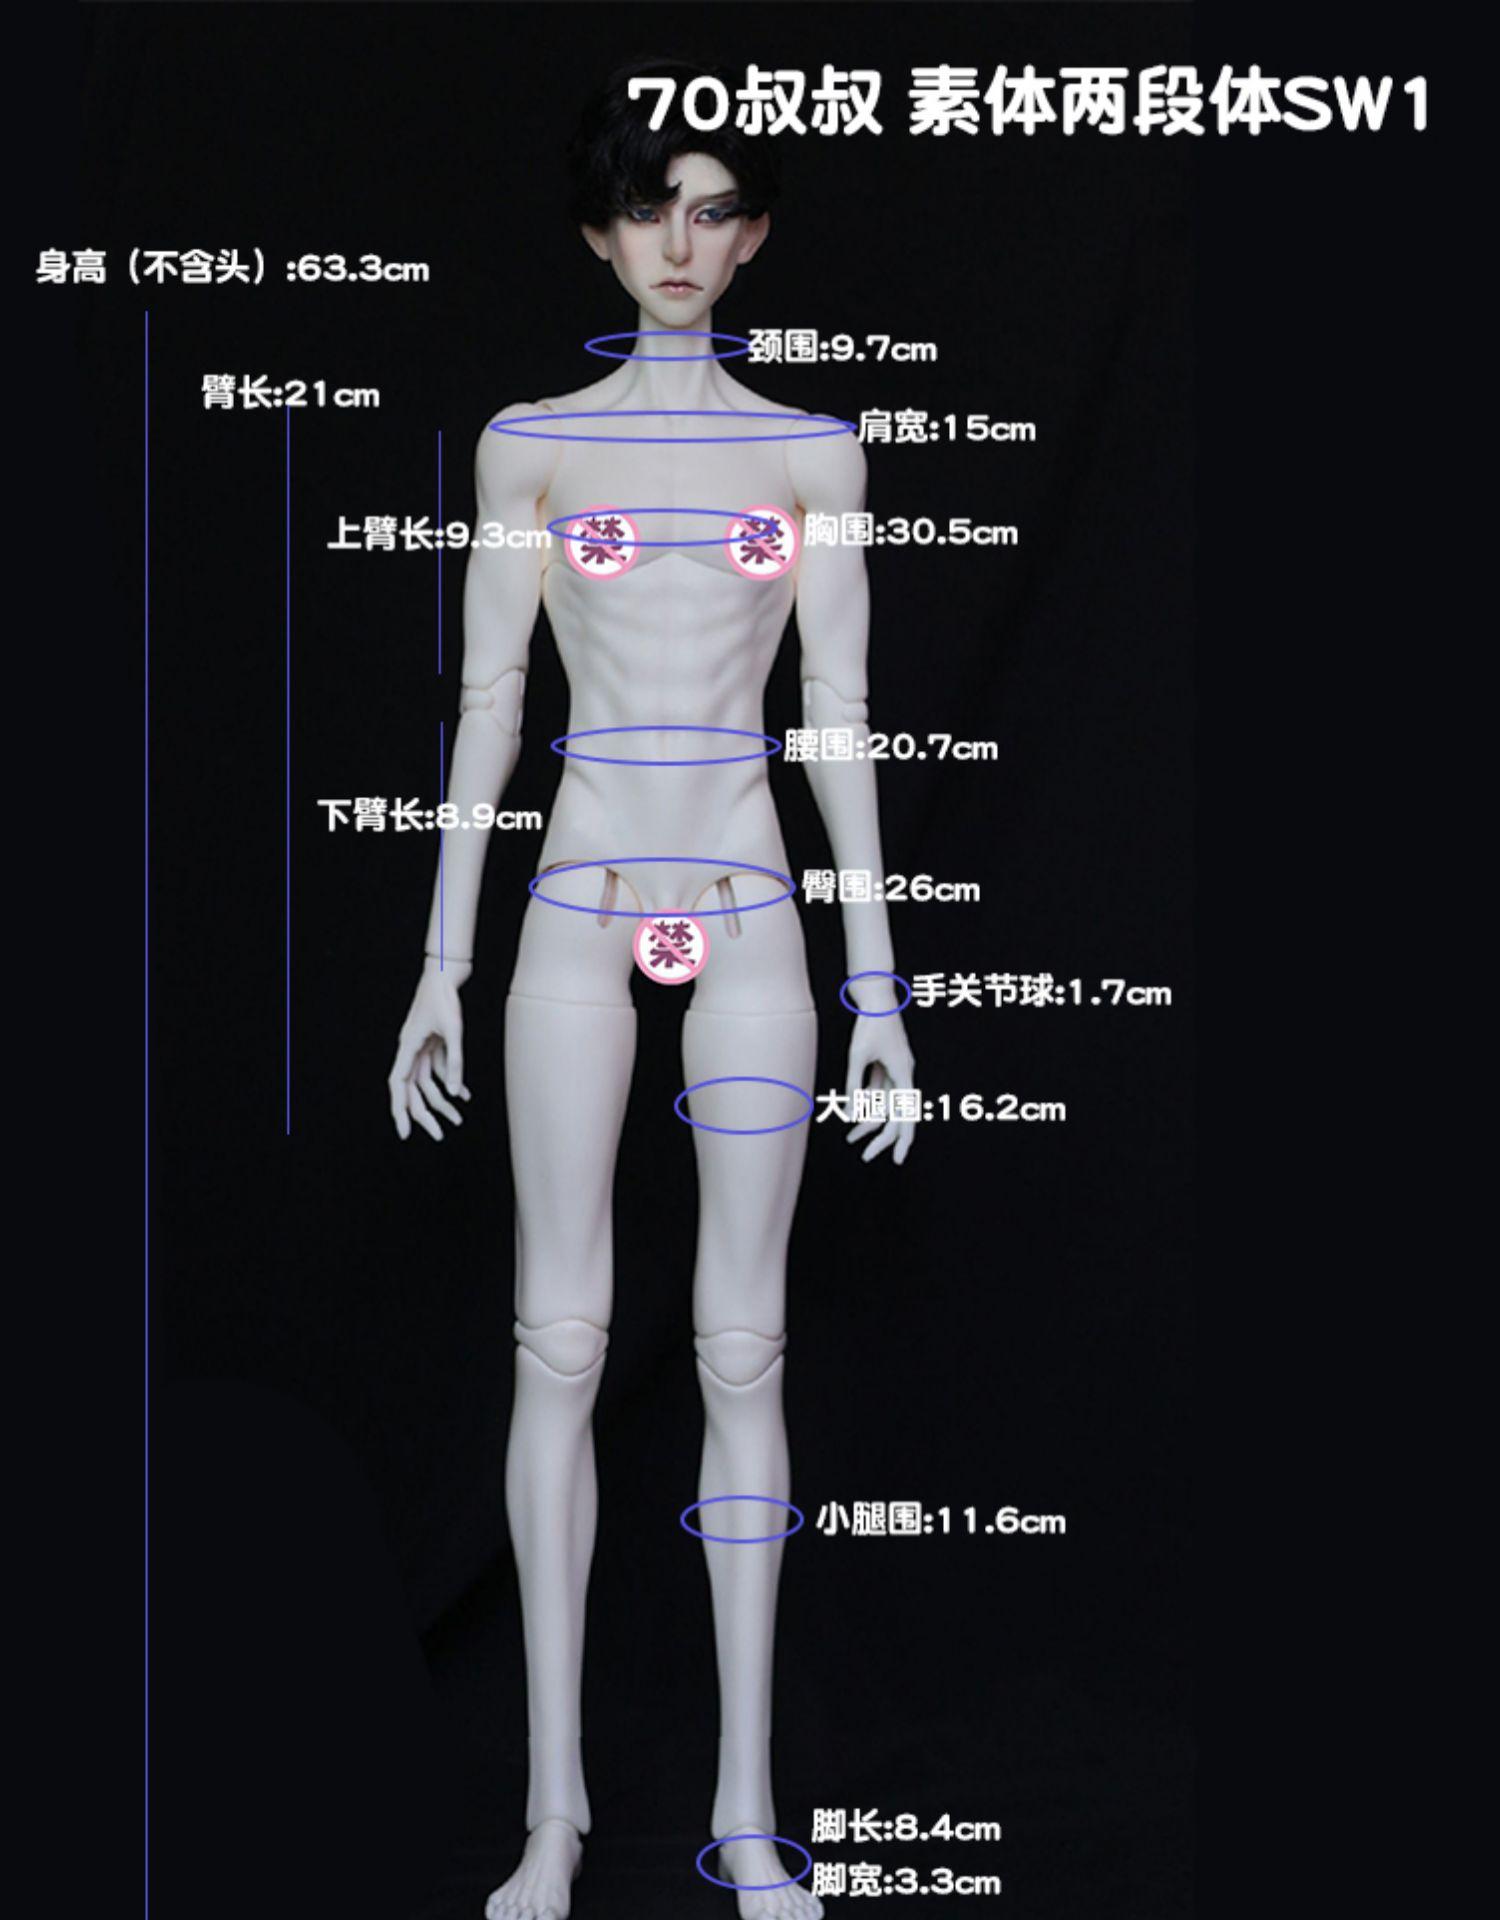 US-body_2.jpg